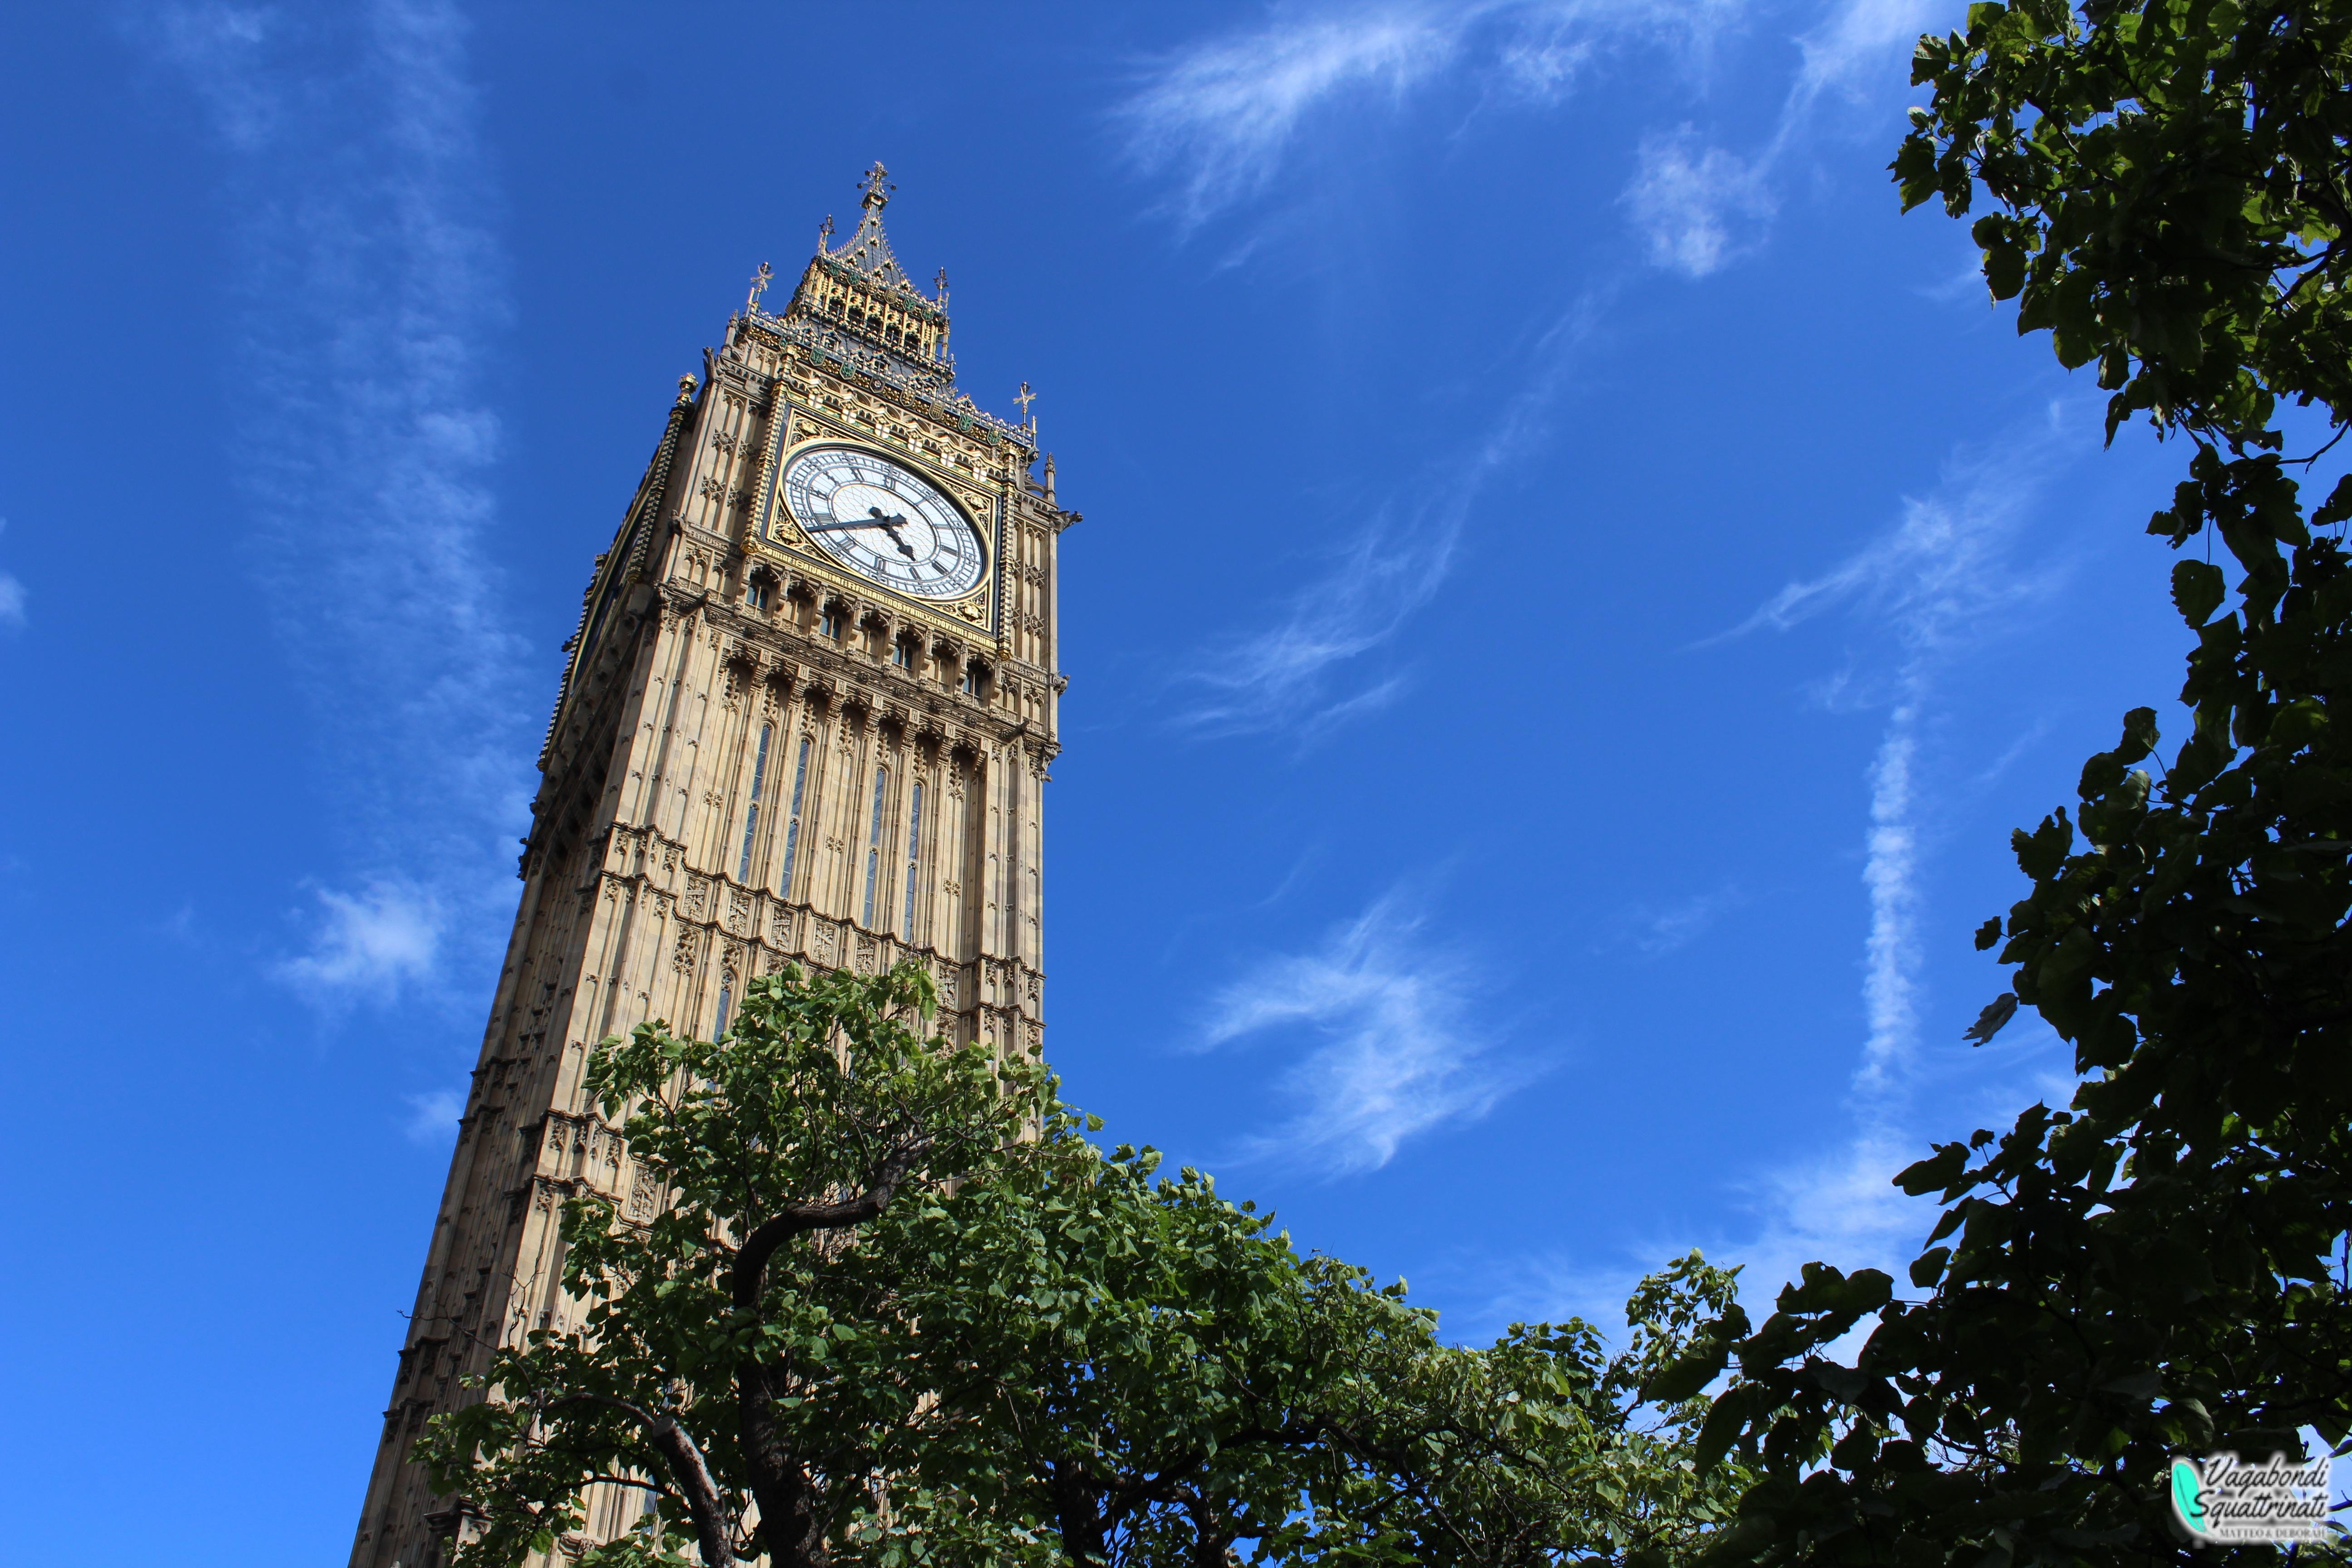 Gratis nero incontri a Londra